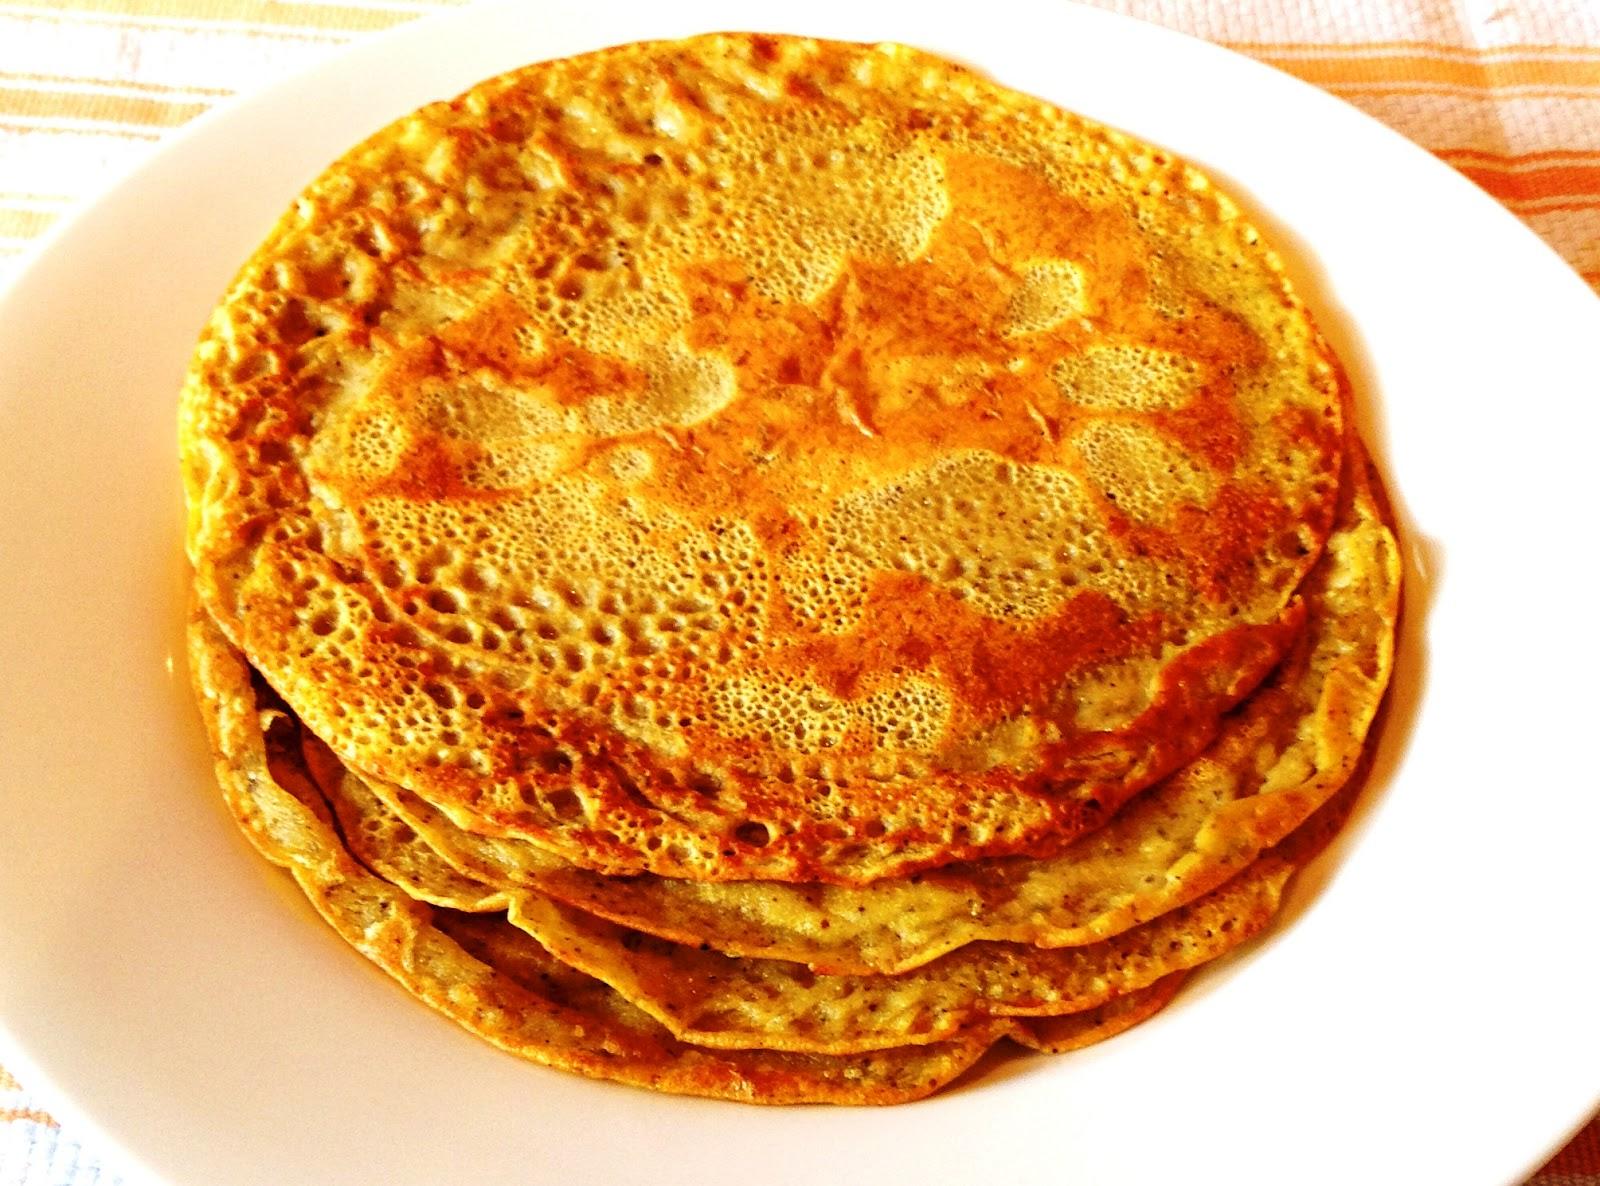 ... Sensitive Epicure: Socca with Za'atar & Sumac (Garbanzo Flour Crepes